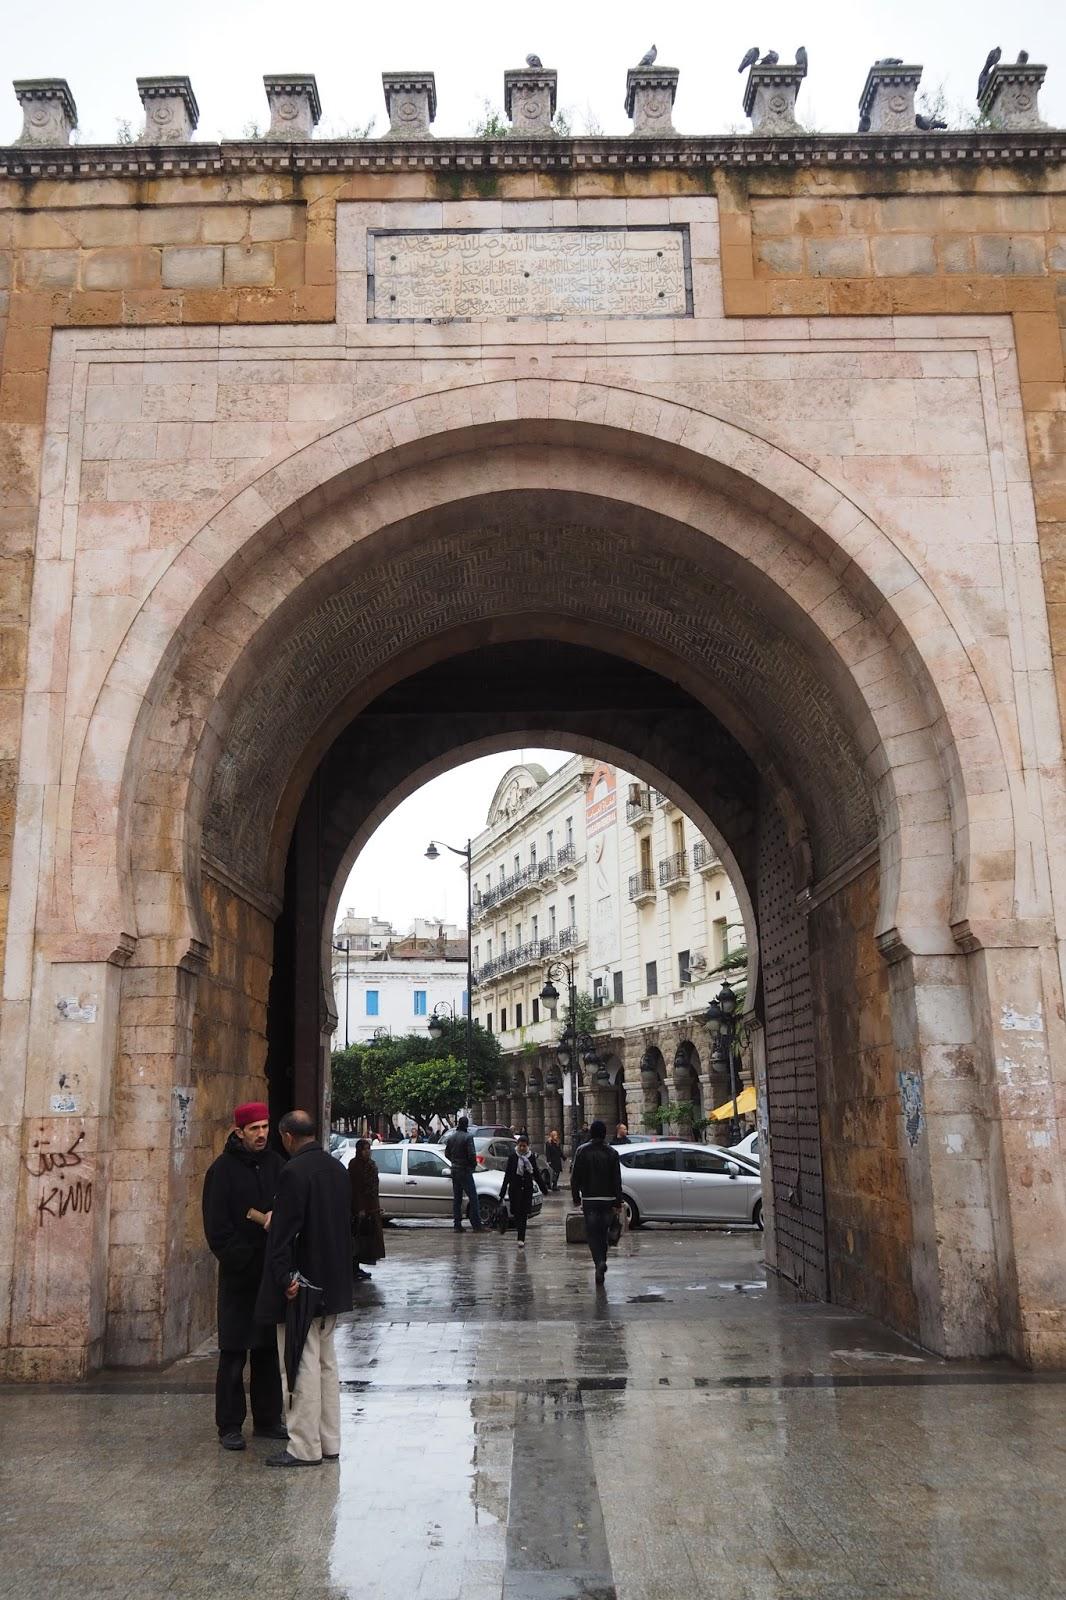 El Zorro: Tunisian Tour. 3 - The Medina of Tunis (突尼西亞之旅.3--突尼斯之麥地那市集)